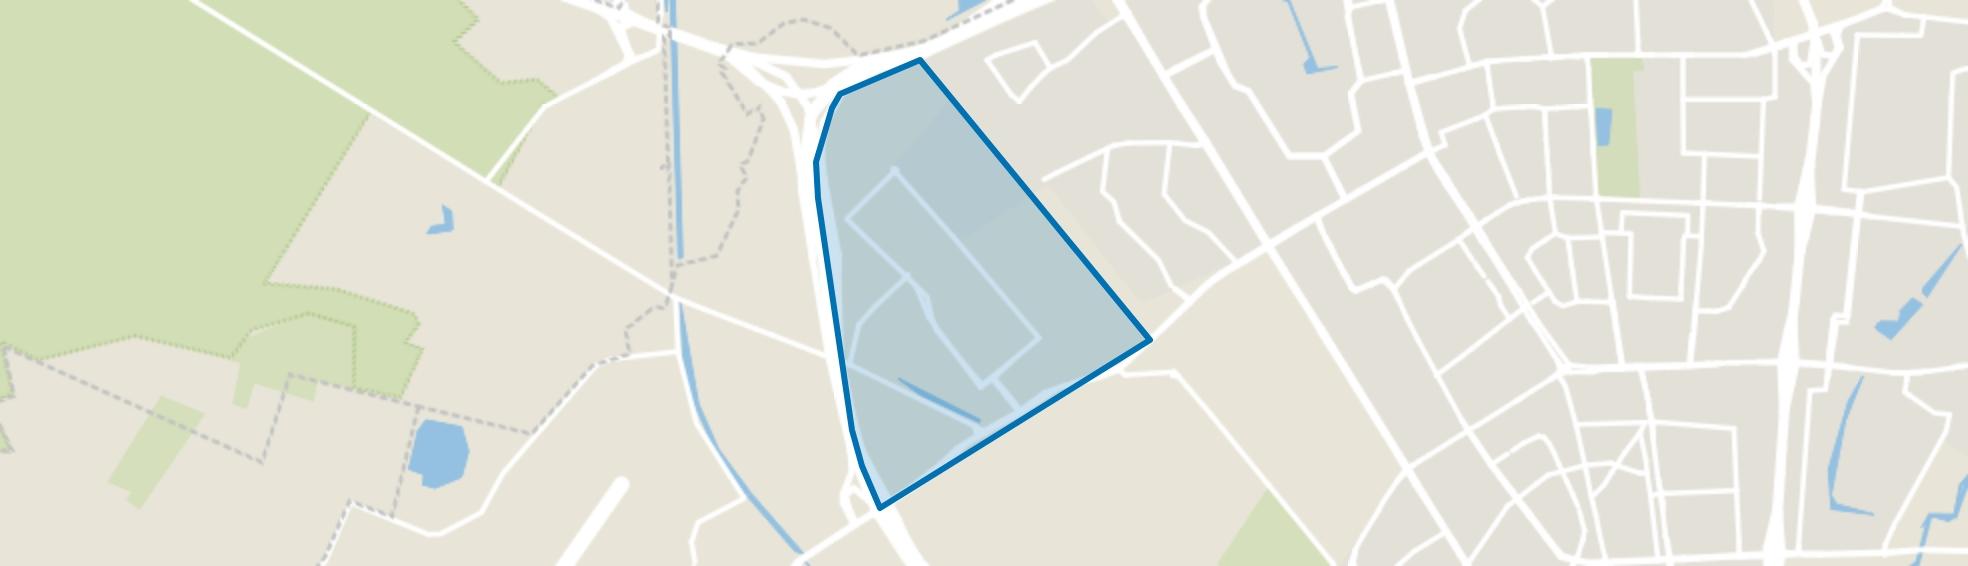 Mispelhoef, Eindhoven map